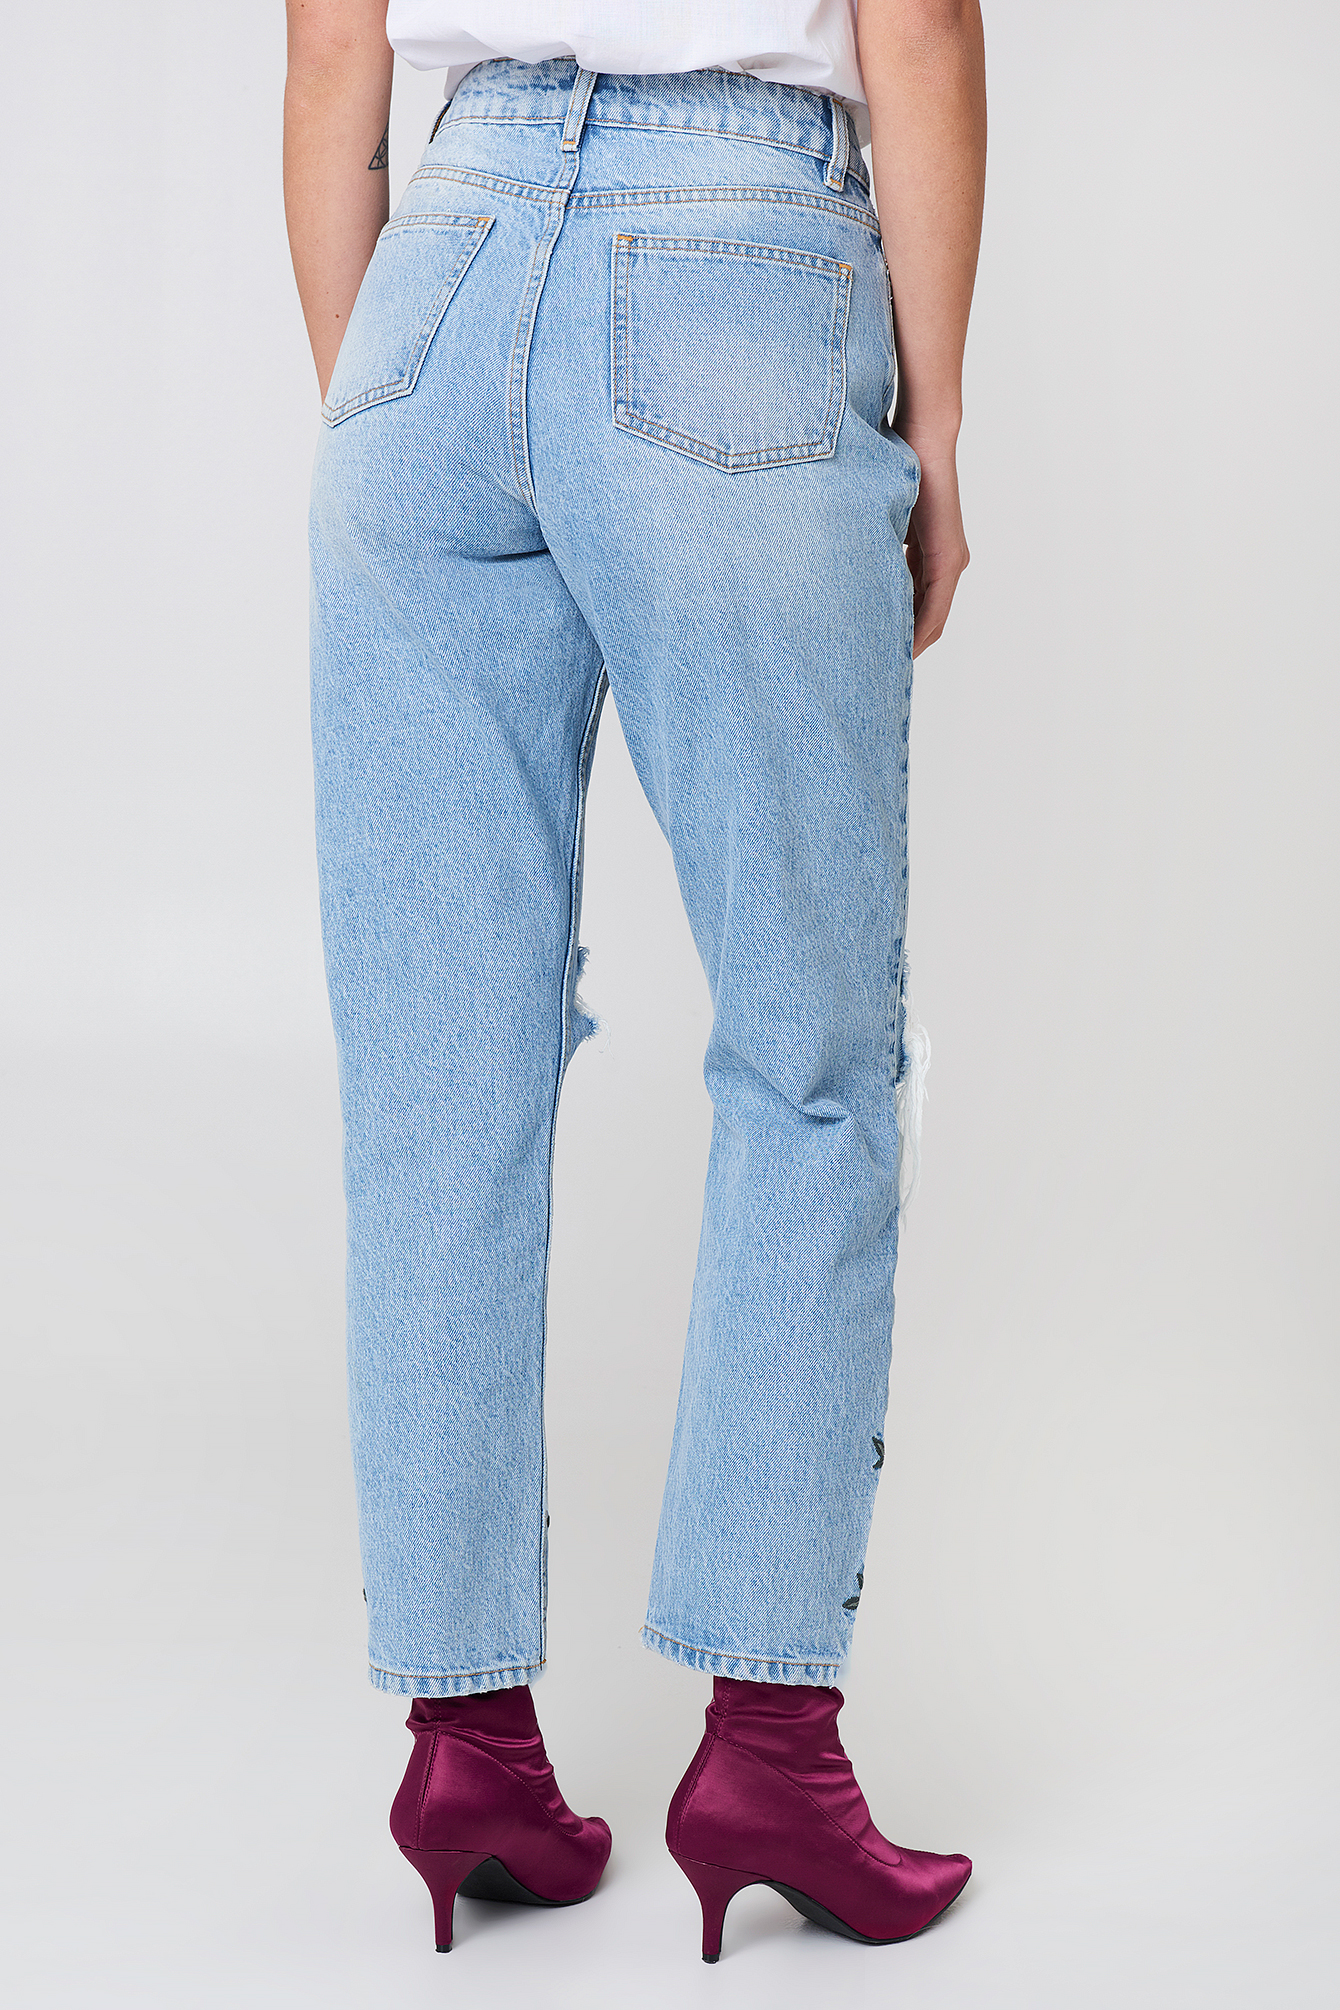 High Waist Embroidered Ankle Jeans NA-KD.COM